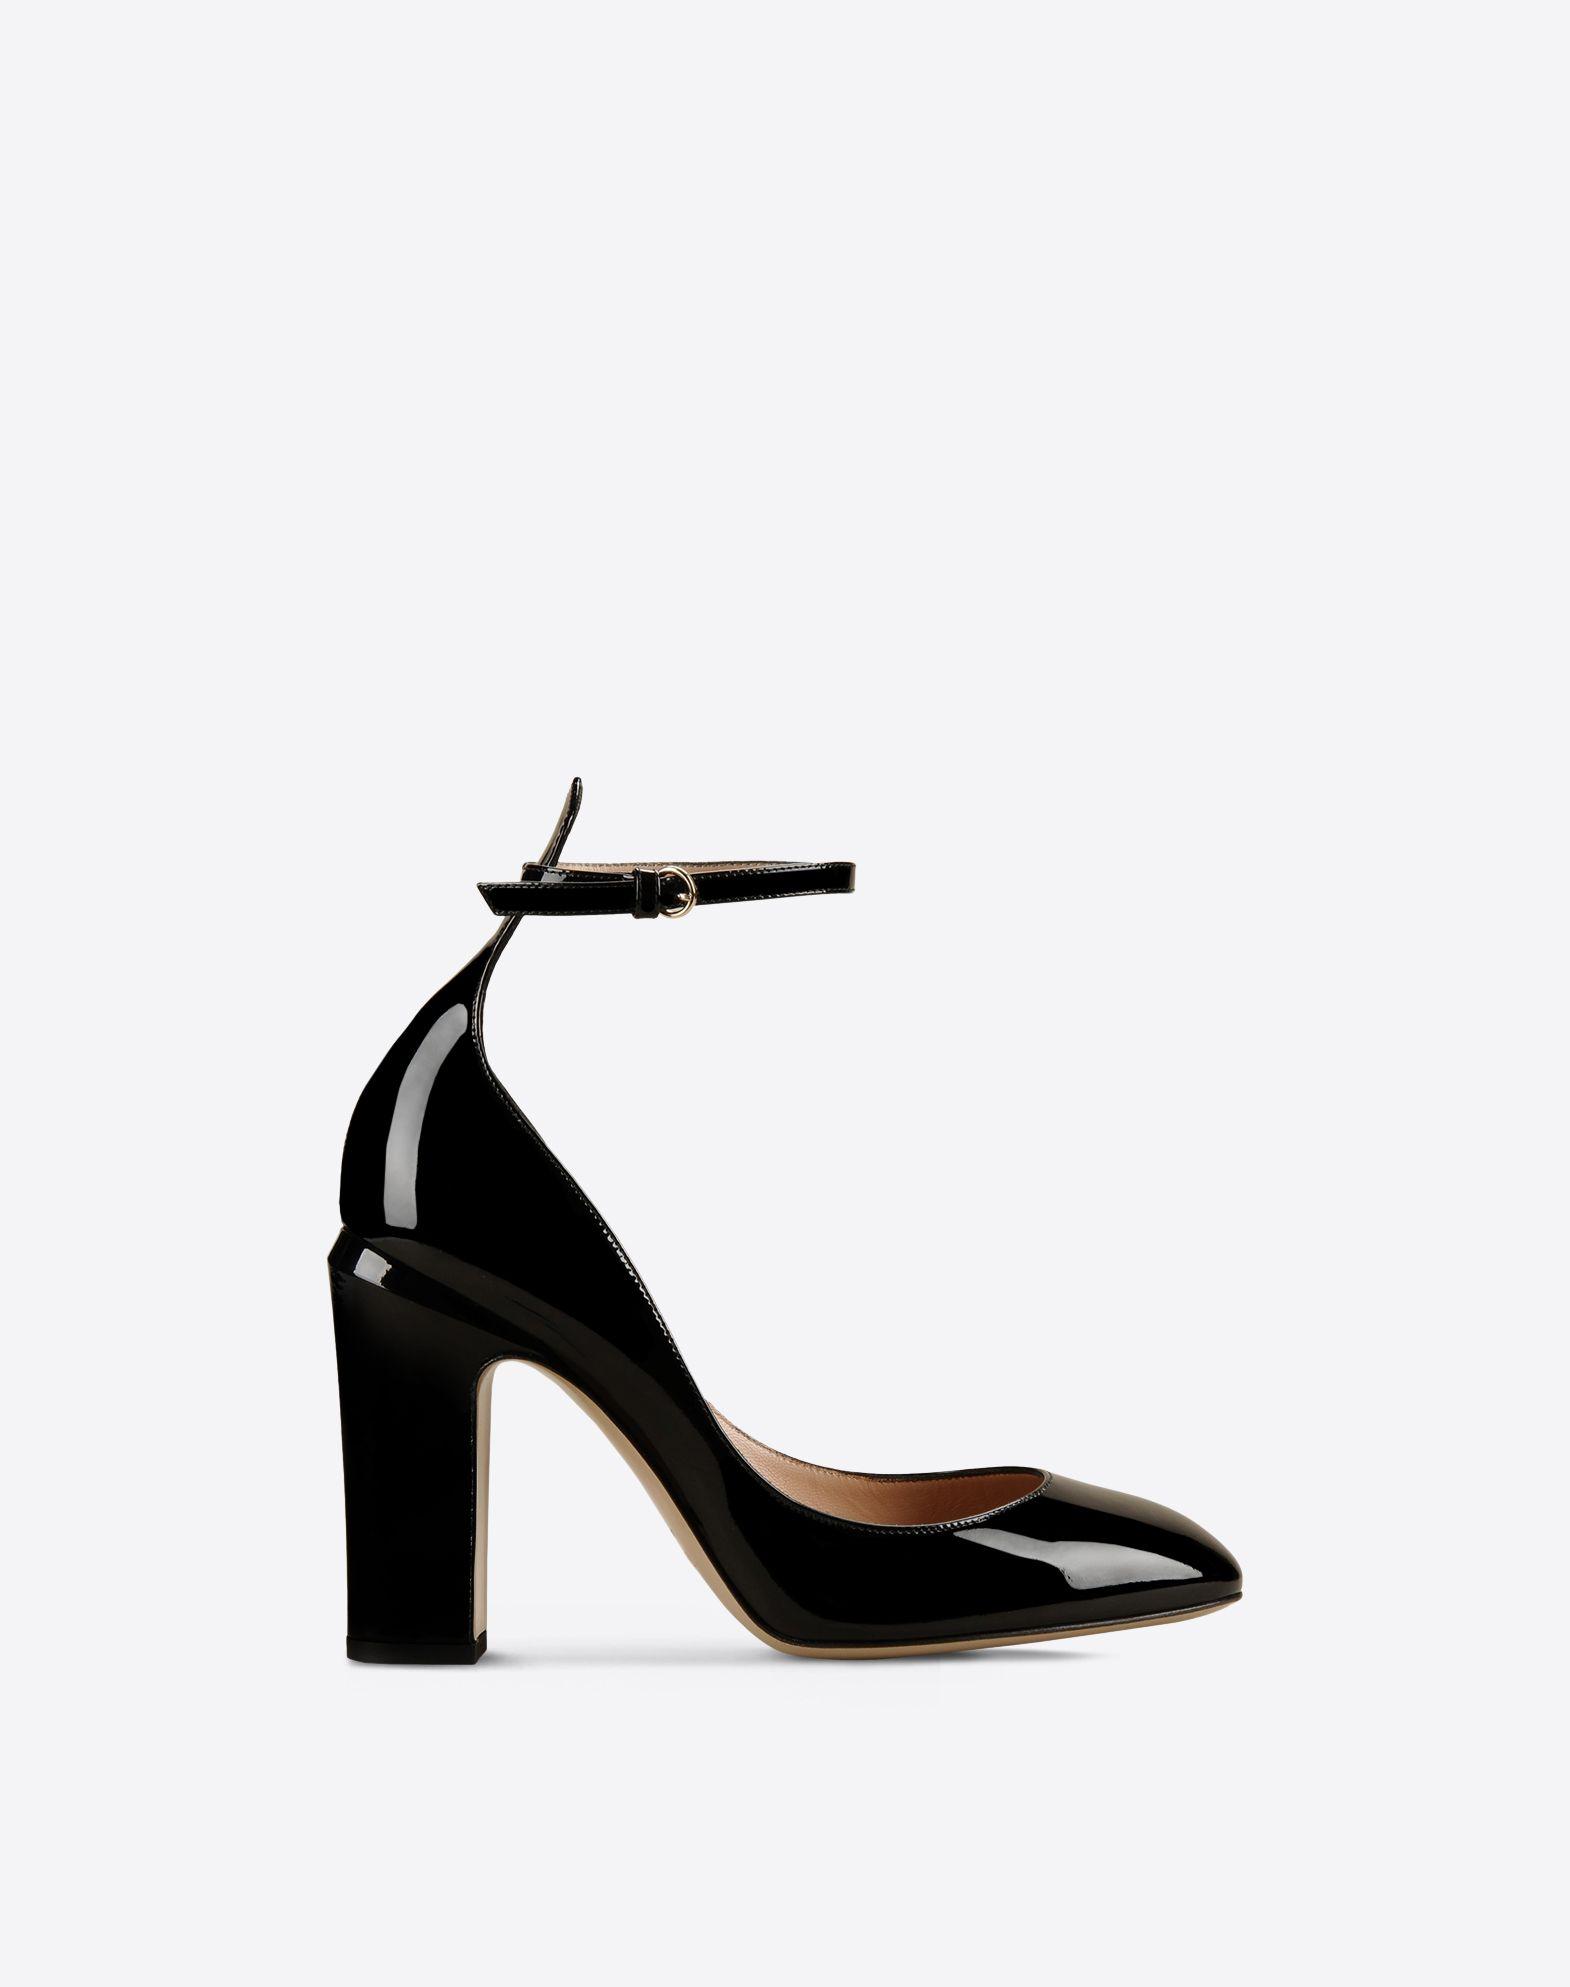 escarpins tan go escarpin femme valentino garavani boutique en ligne valentino. Black Bedroom Furniture Sets. Home Design Ideas